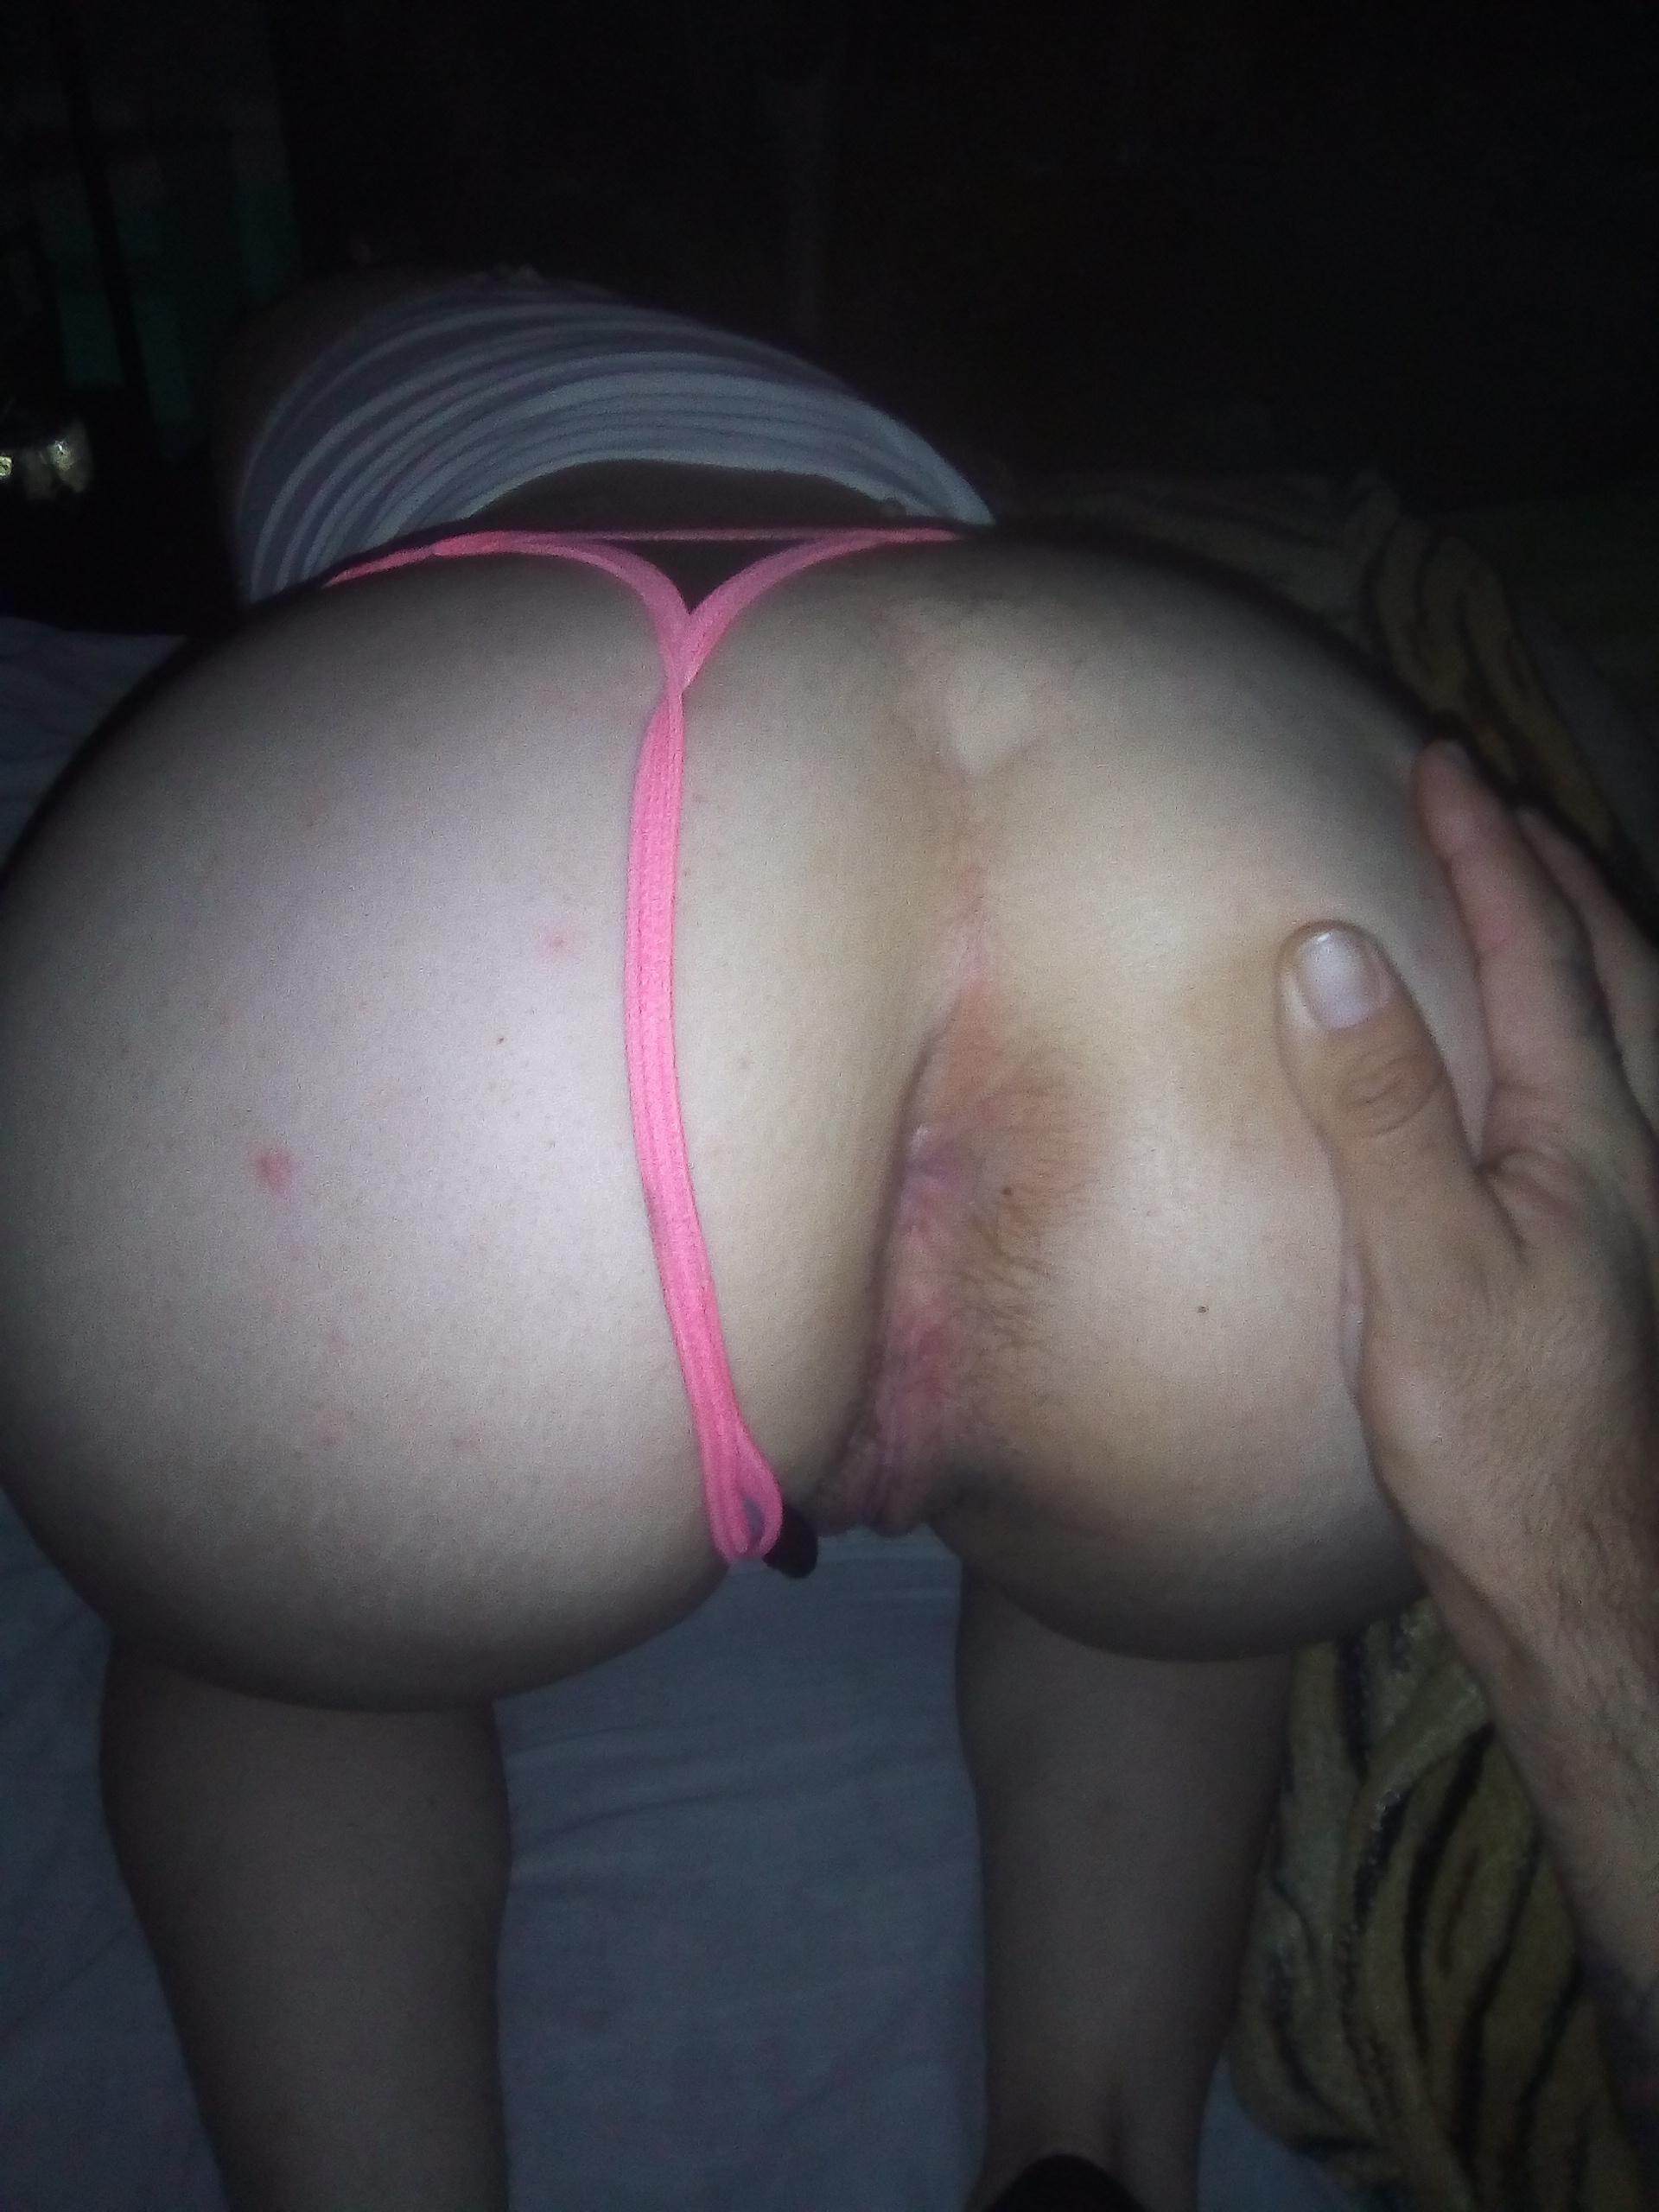 esposas xxx, fotos mujeres para sexo gratis